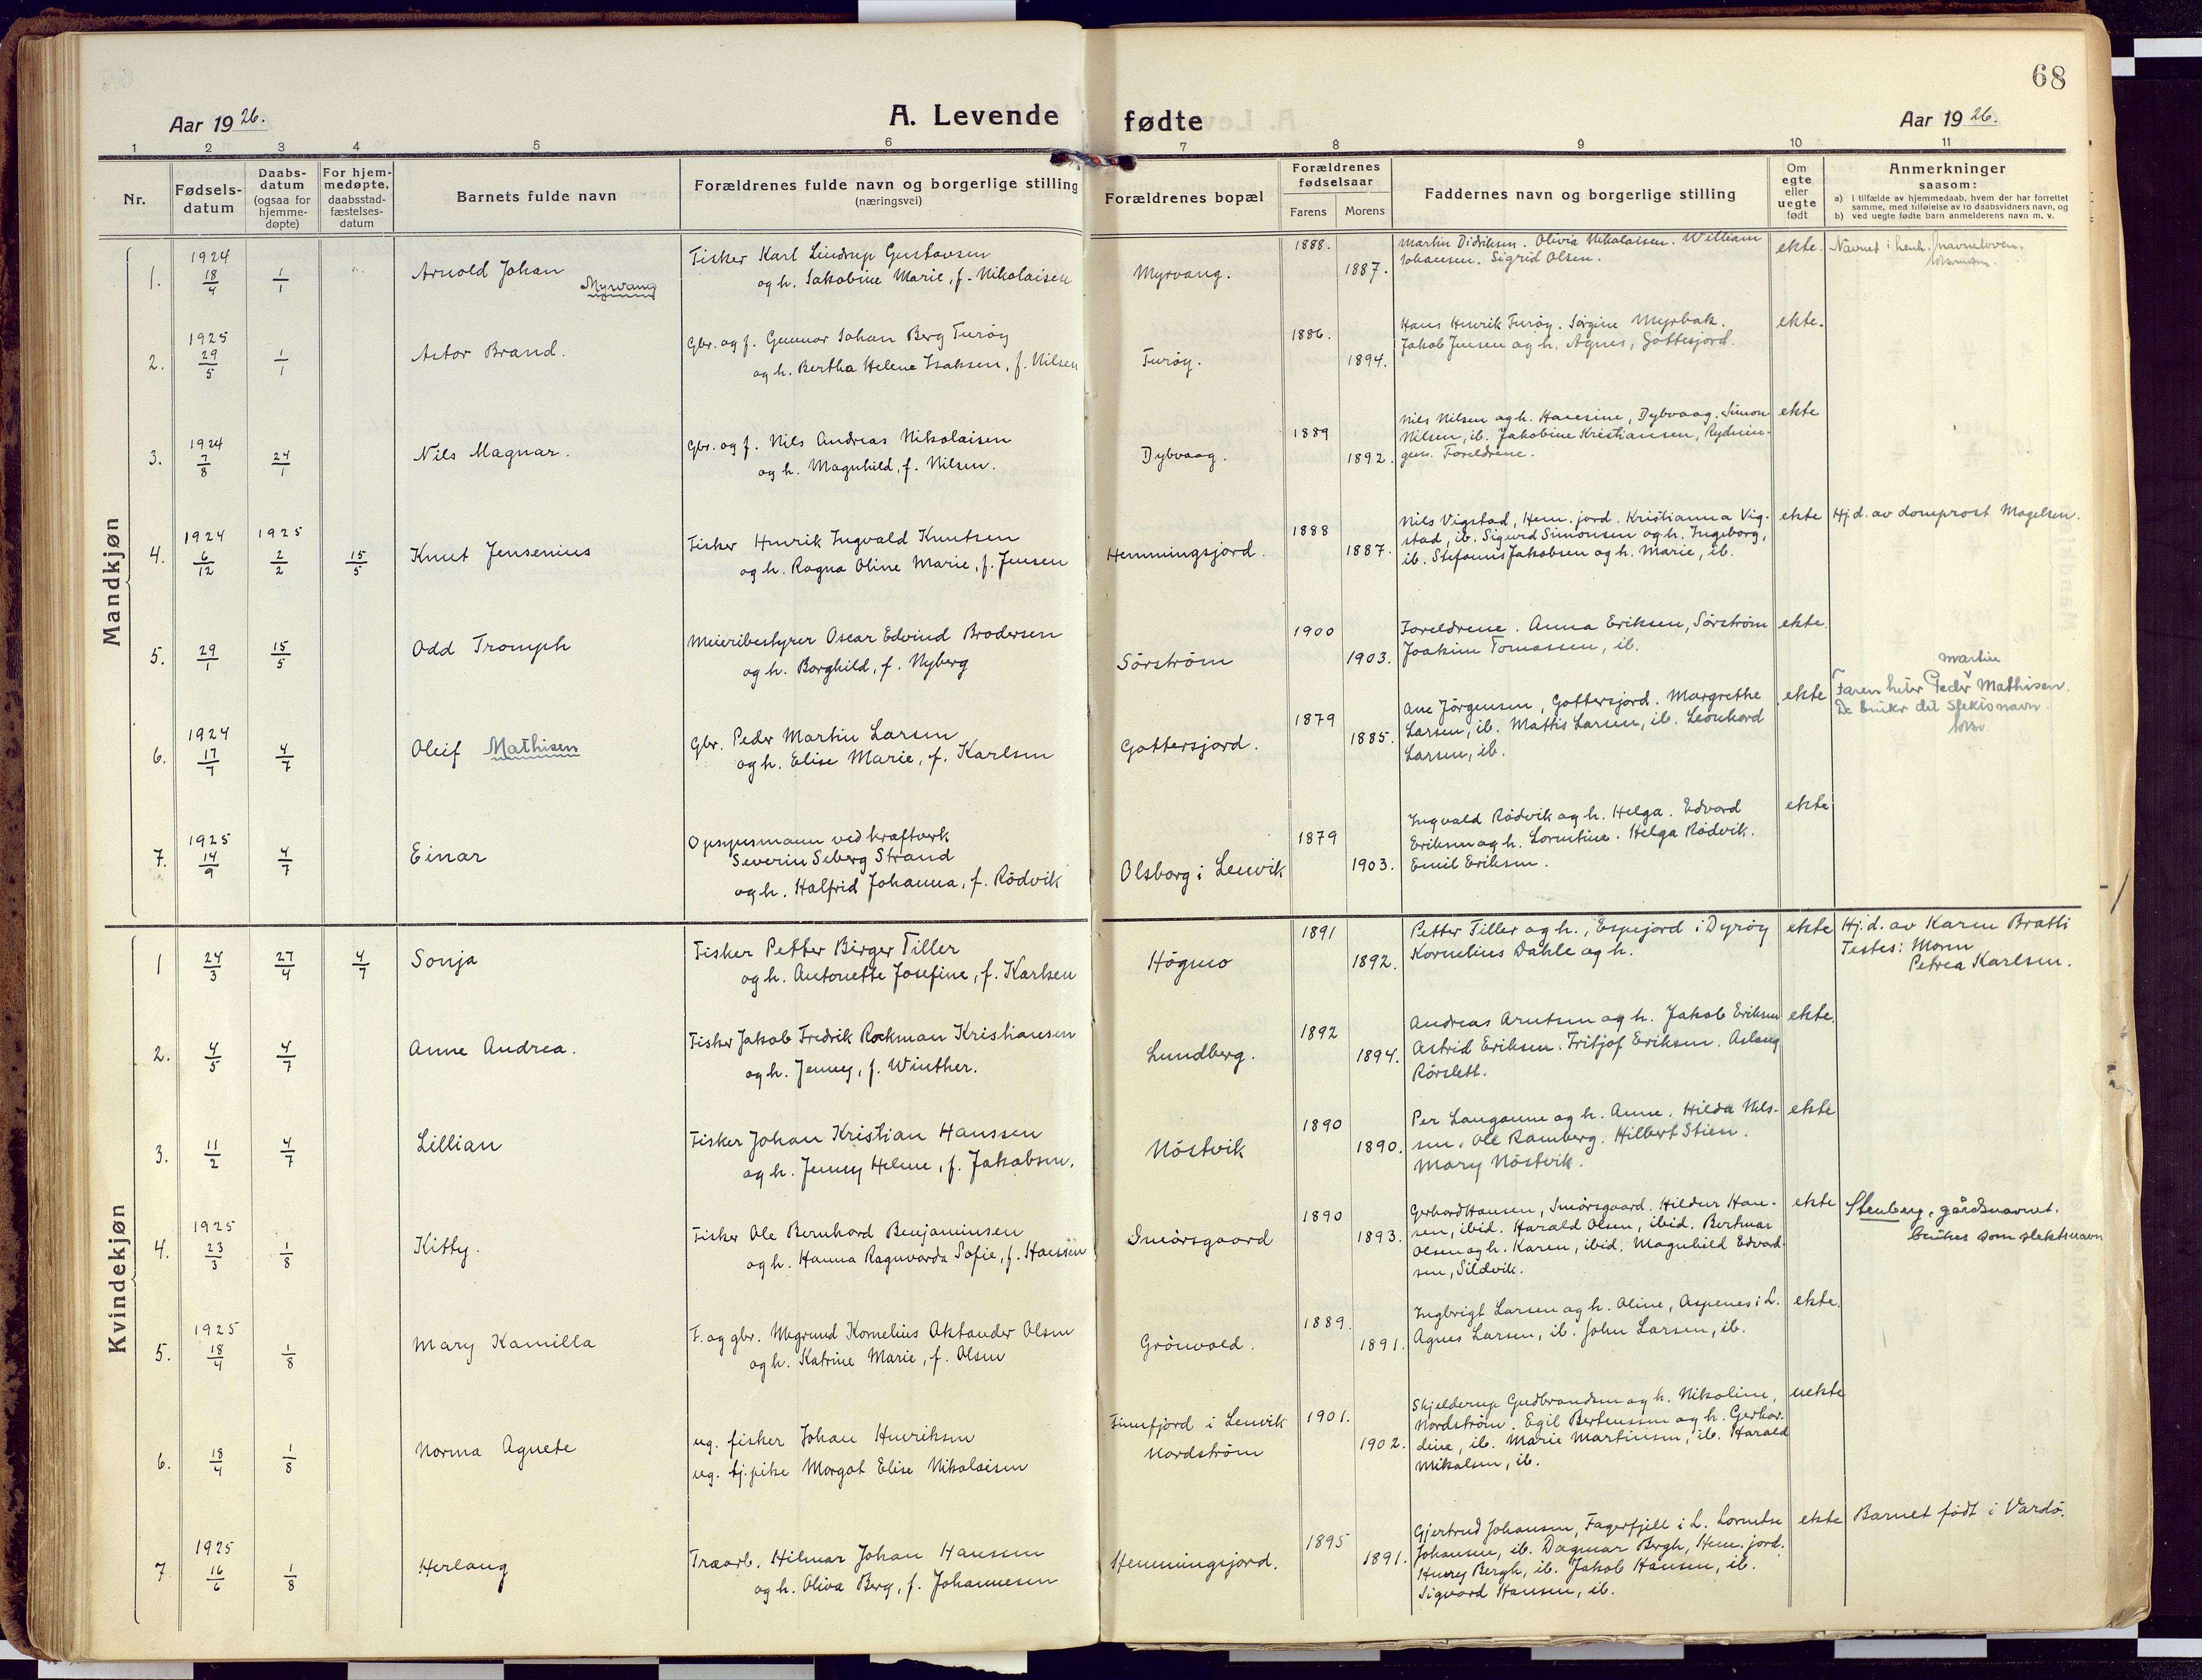 SATØ, Tranøy sokneprestkontor, I/Ia/Iaa/L0015kirke: Ministerialbok nr. 15, 1919-1928, s. 68